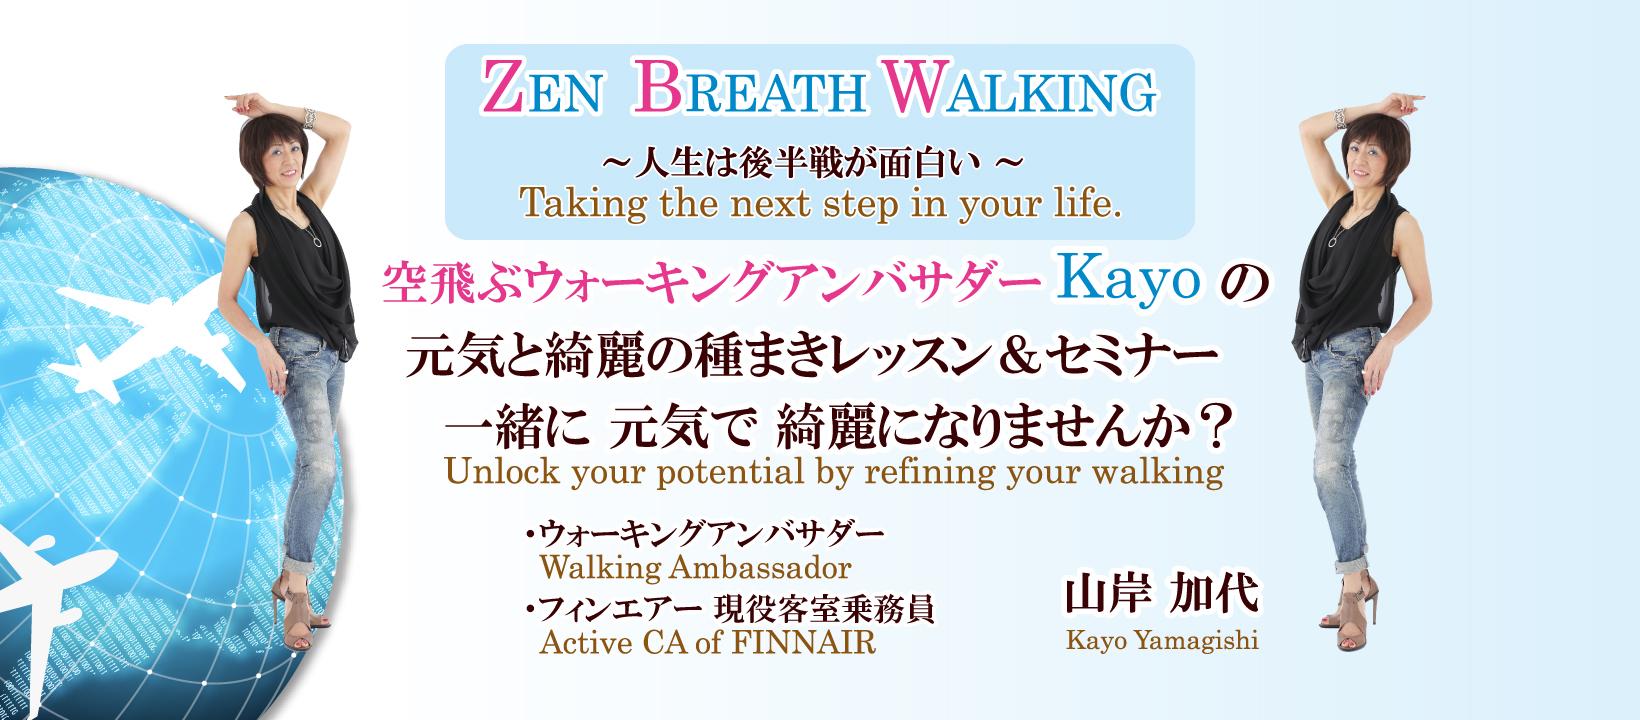 Kayo 様 Facebookページトップ画像 2020年1月 Ver.